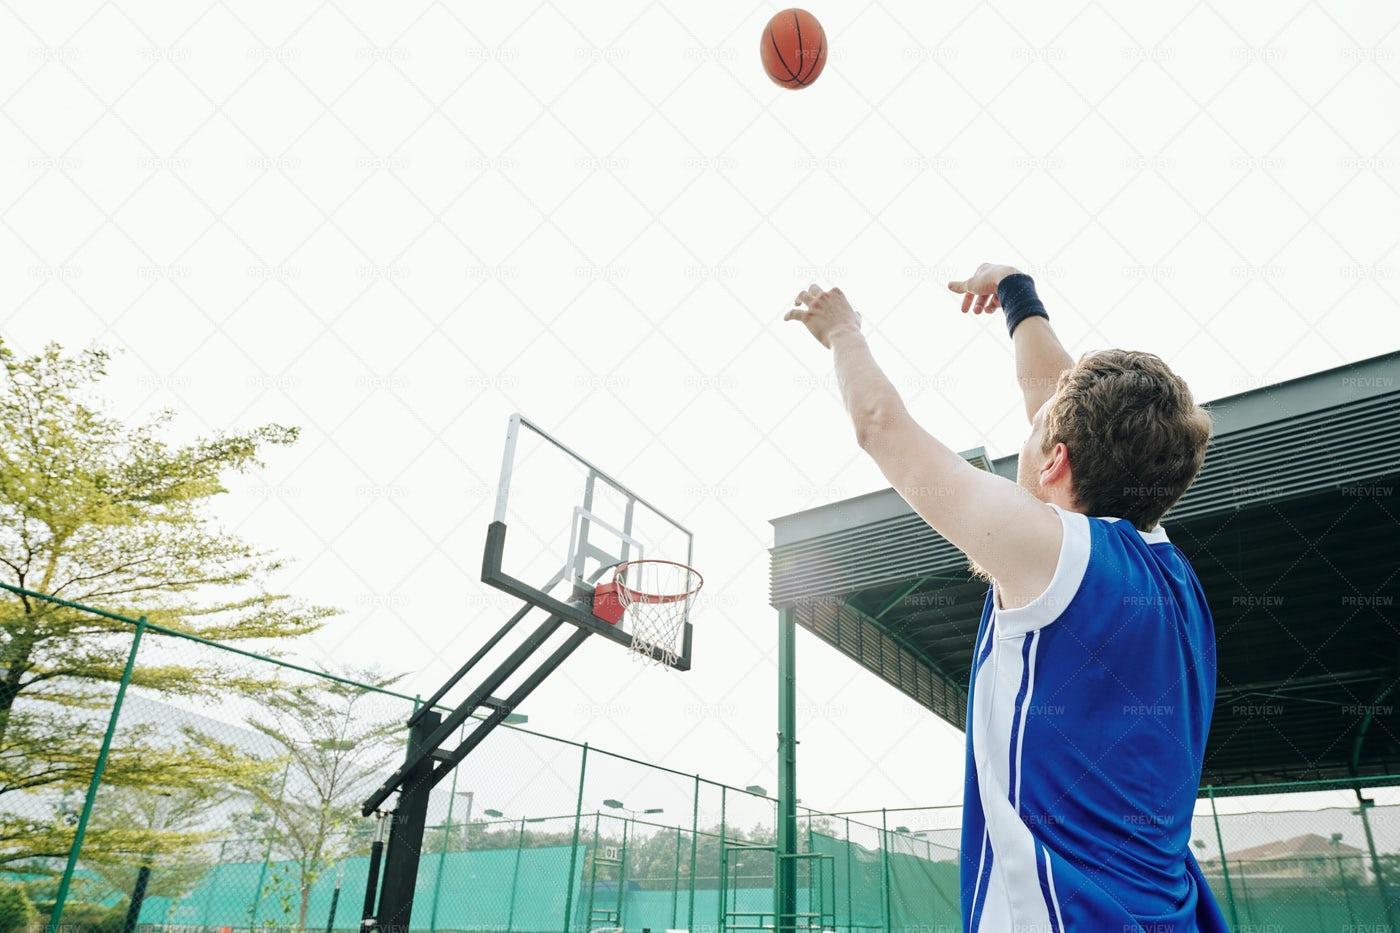 Sportsman Playing Basketball: Stock Photos